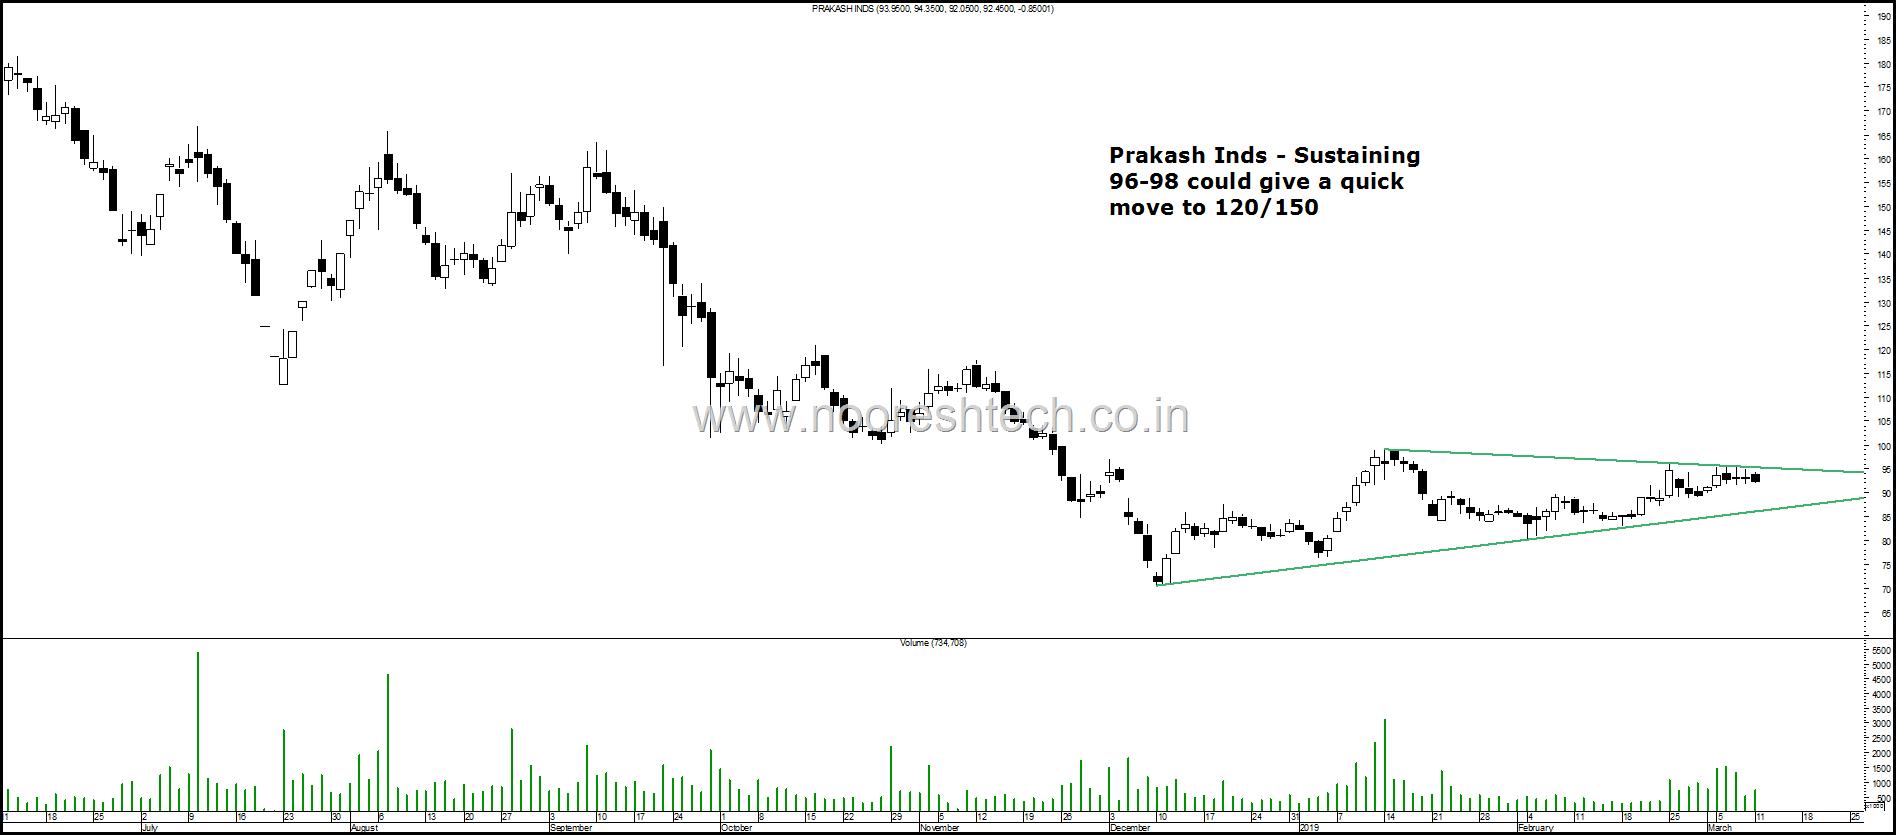 Prakash Inds